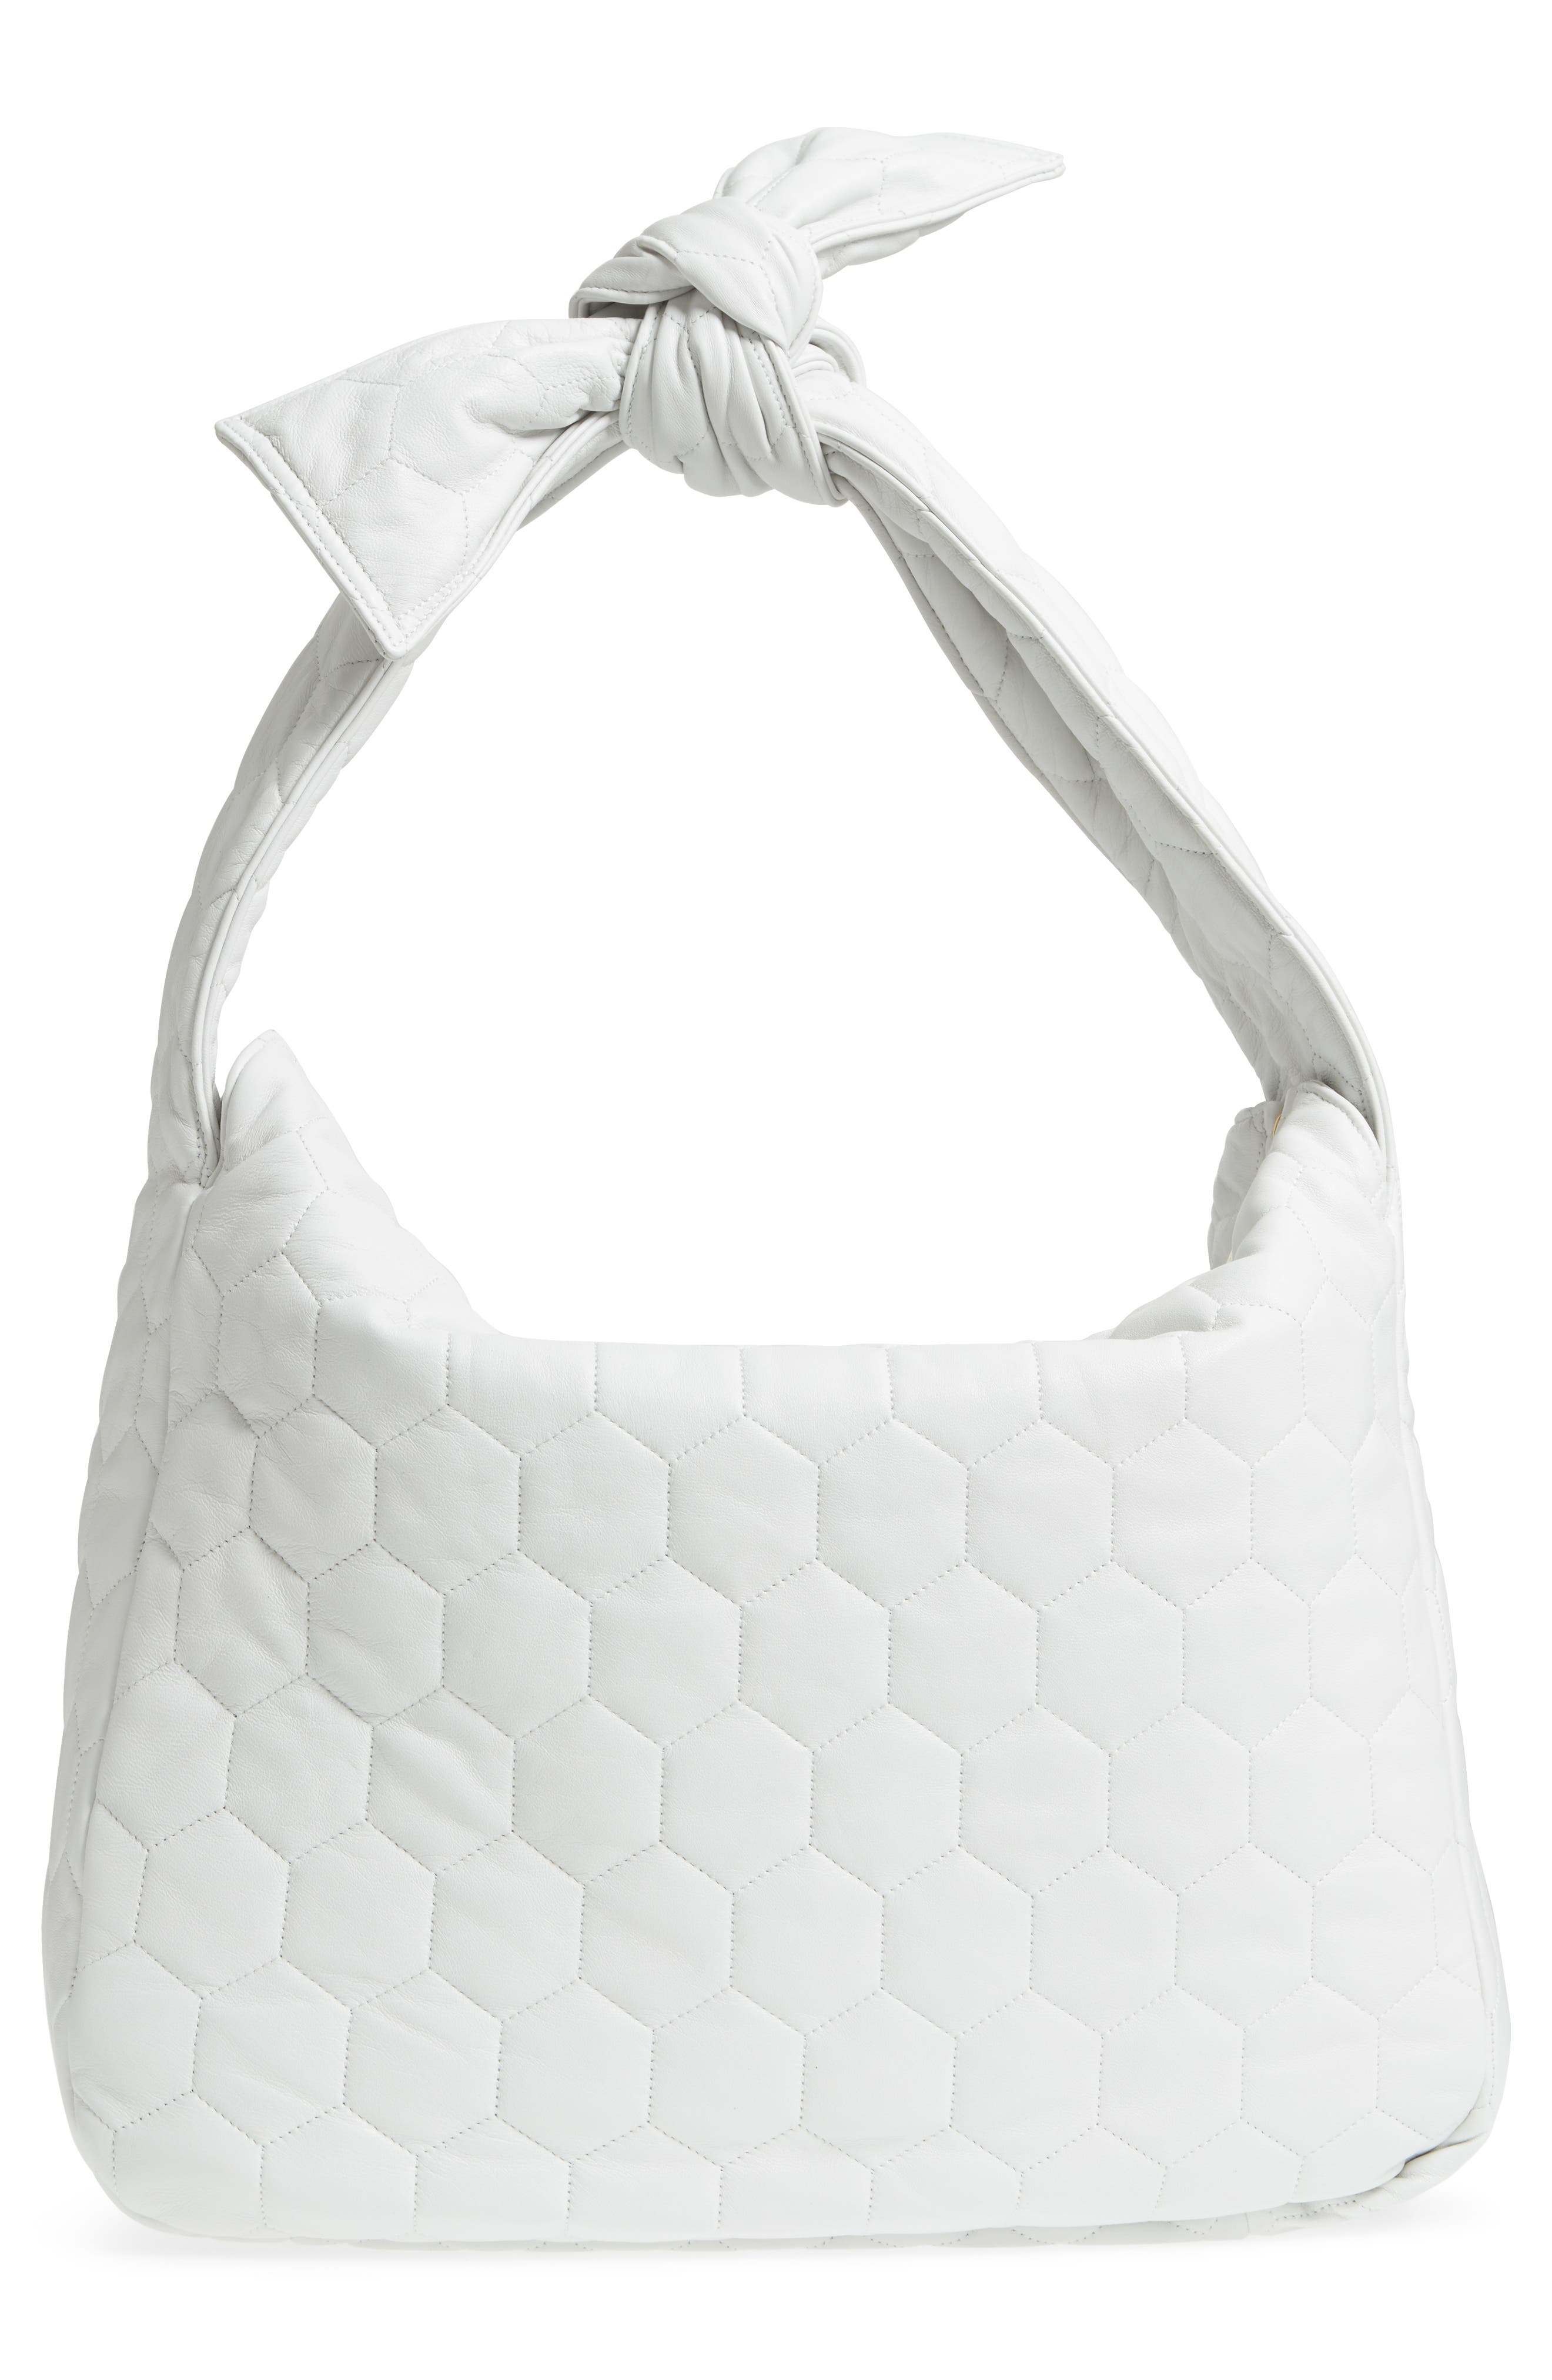 Balloon Leather Shoulder Bag,                             Alternate thumbnail 3, color,